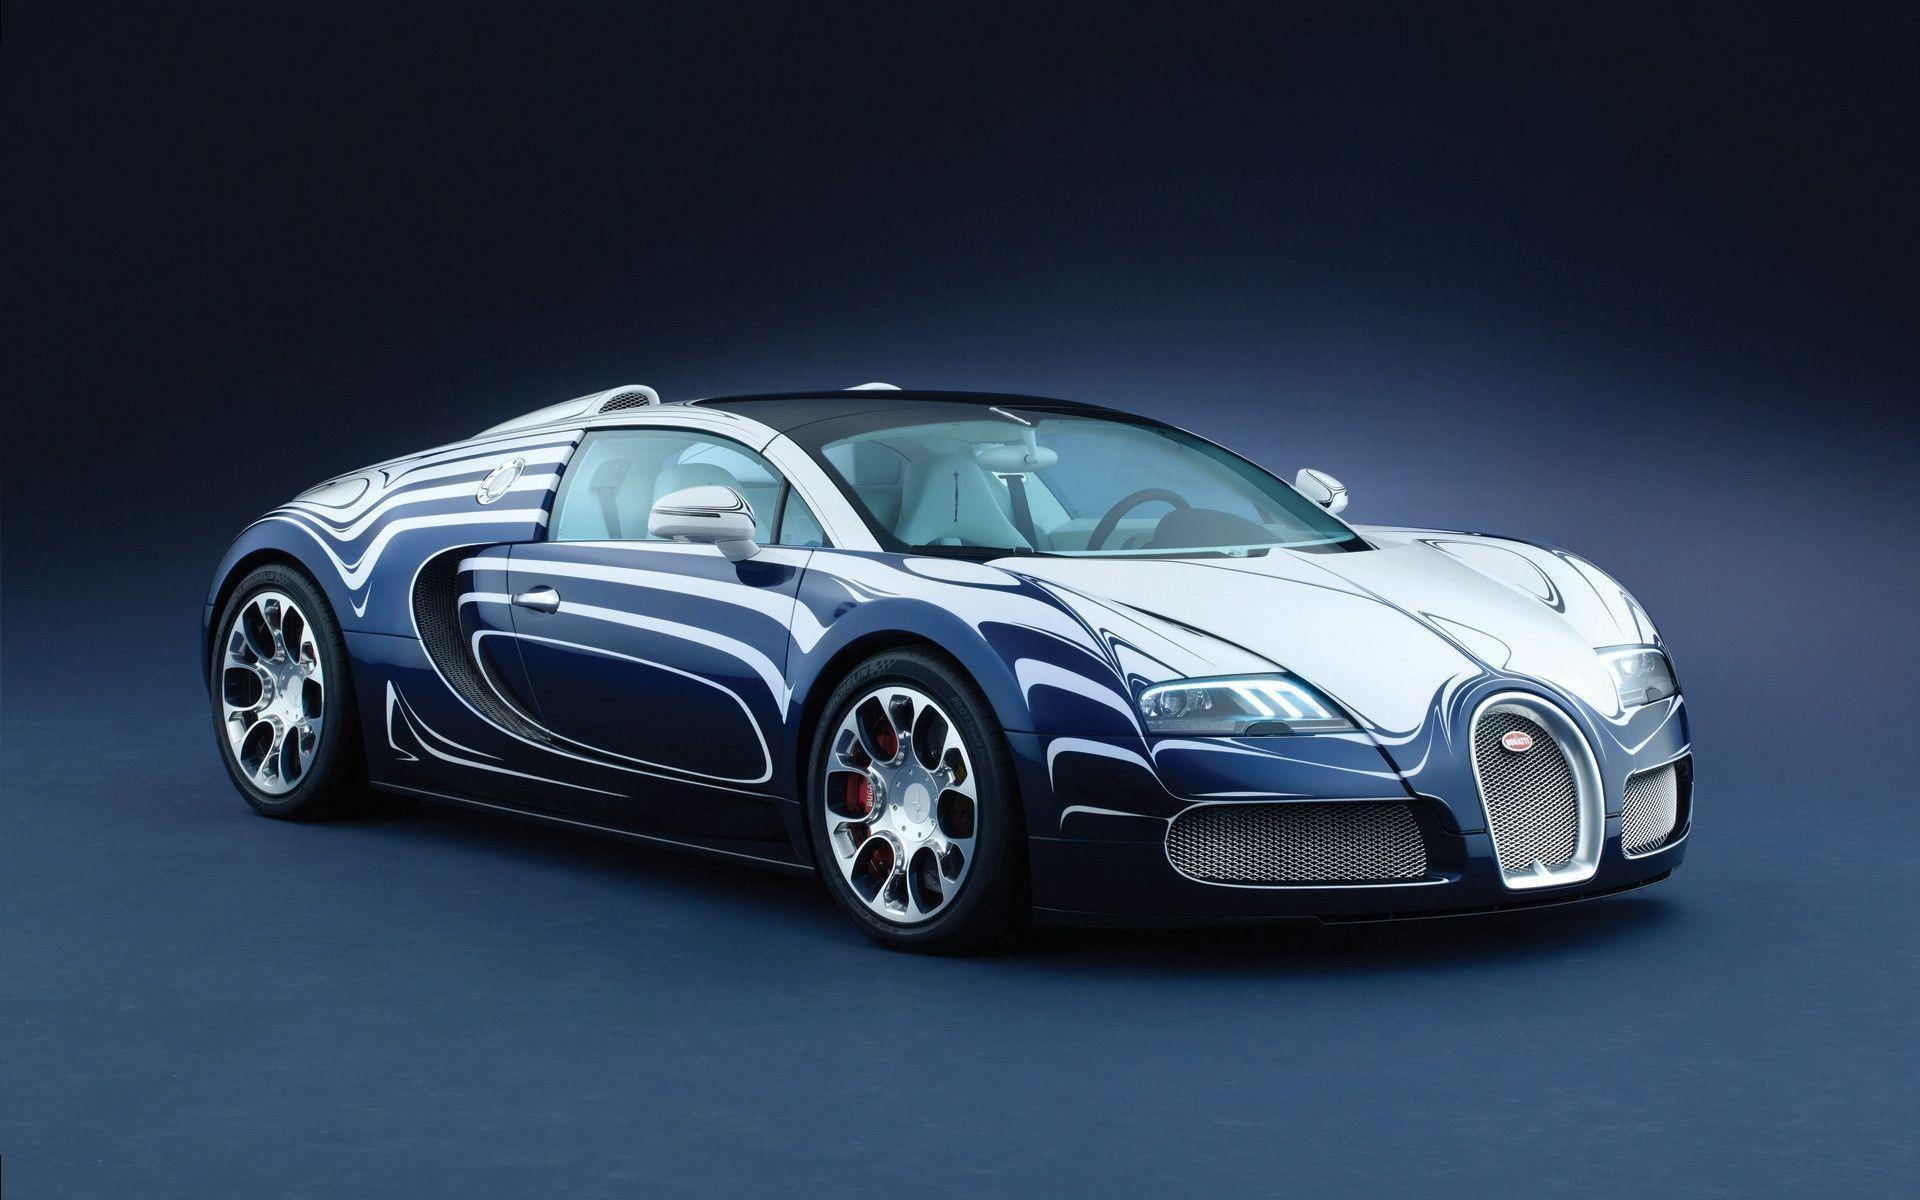 Bugatti Veyron Super Sport Wallpaper: Bugatti Veyron Wallpapers HD